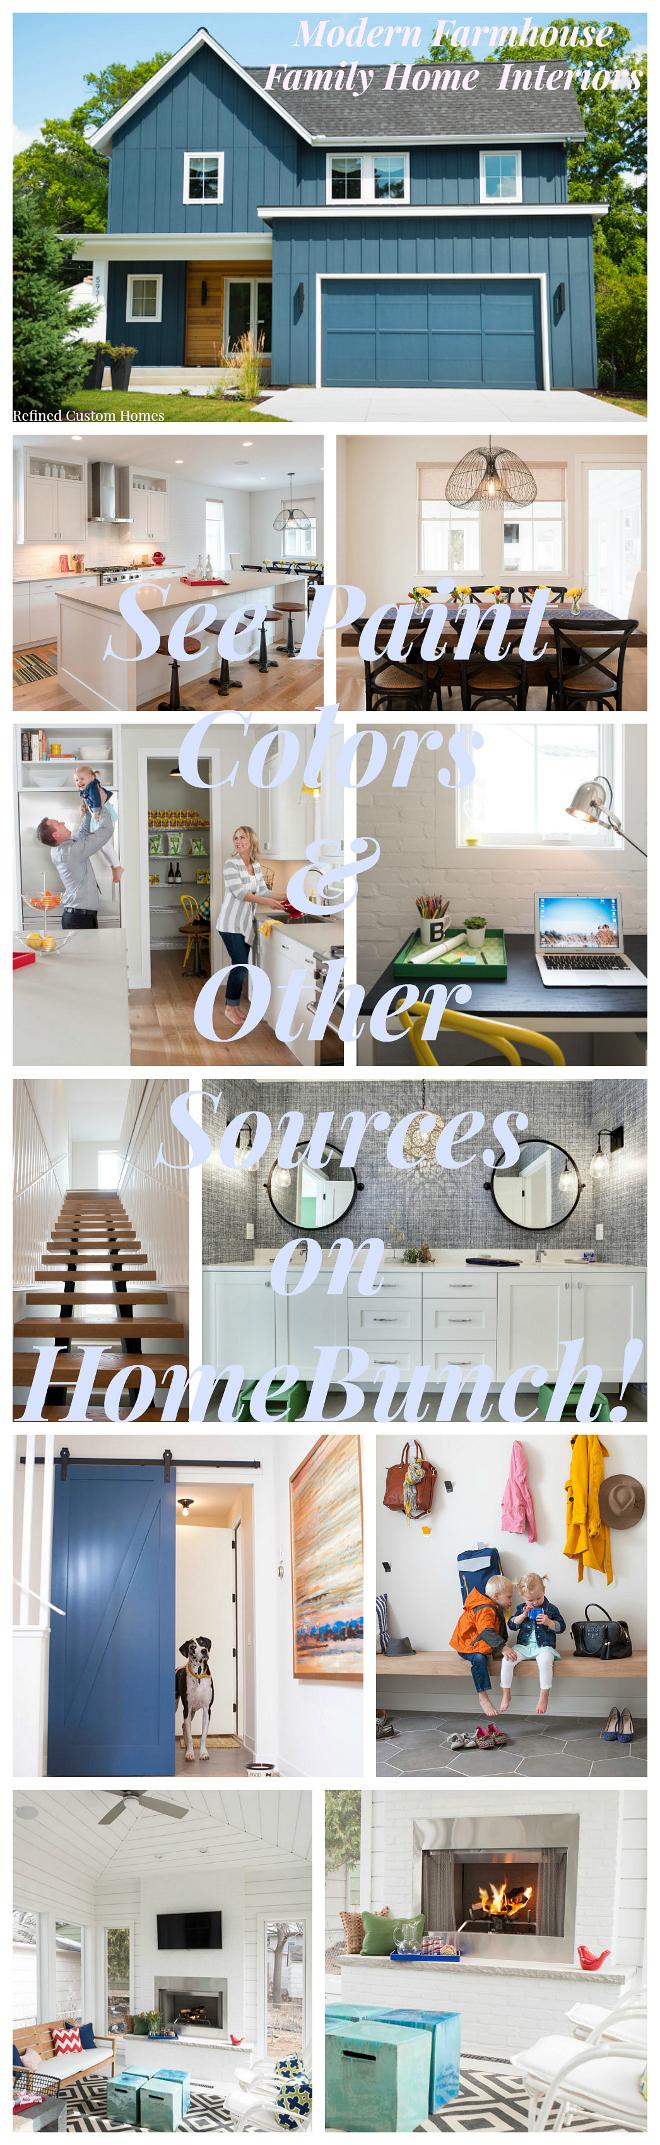 Modern Farmhouse Family Home Interiors. Modern Farmhouse Family Home Interiors. Modern Farmhouse Family Home Interiors Modern Farmhouse Family Home Interiors #ModernFarmhouse #FamilyHome #Interiors